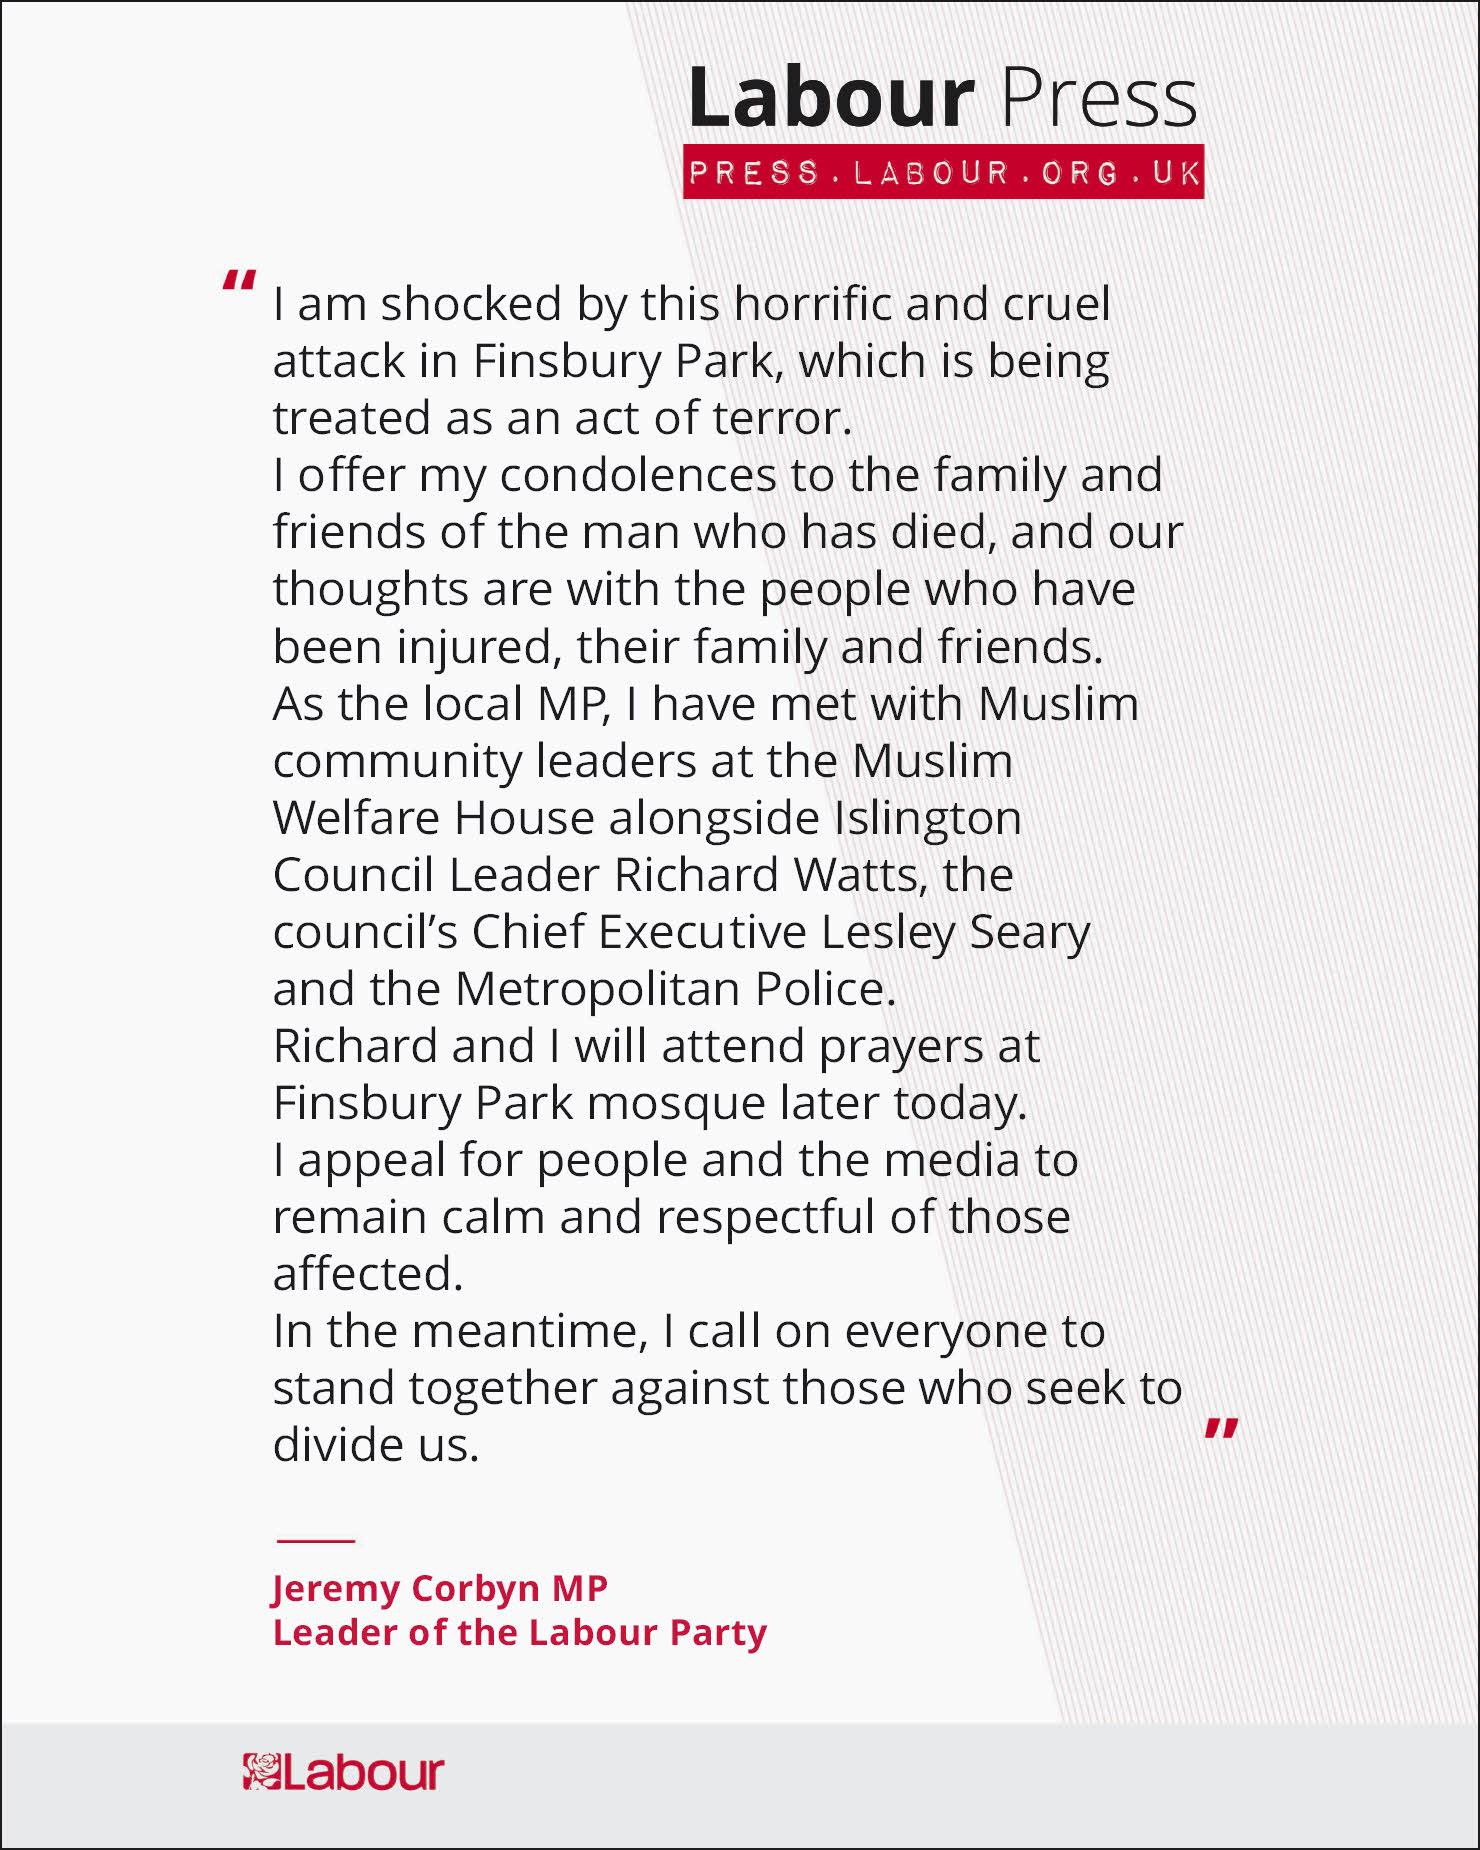 .@jeremycorbyn statement on van attack in Finsbury Park https://t.co/COAKXBKg0r https://t.co/tqKi1ffPdu